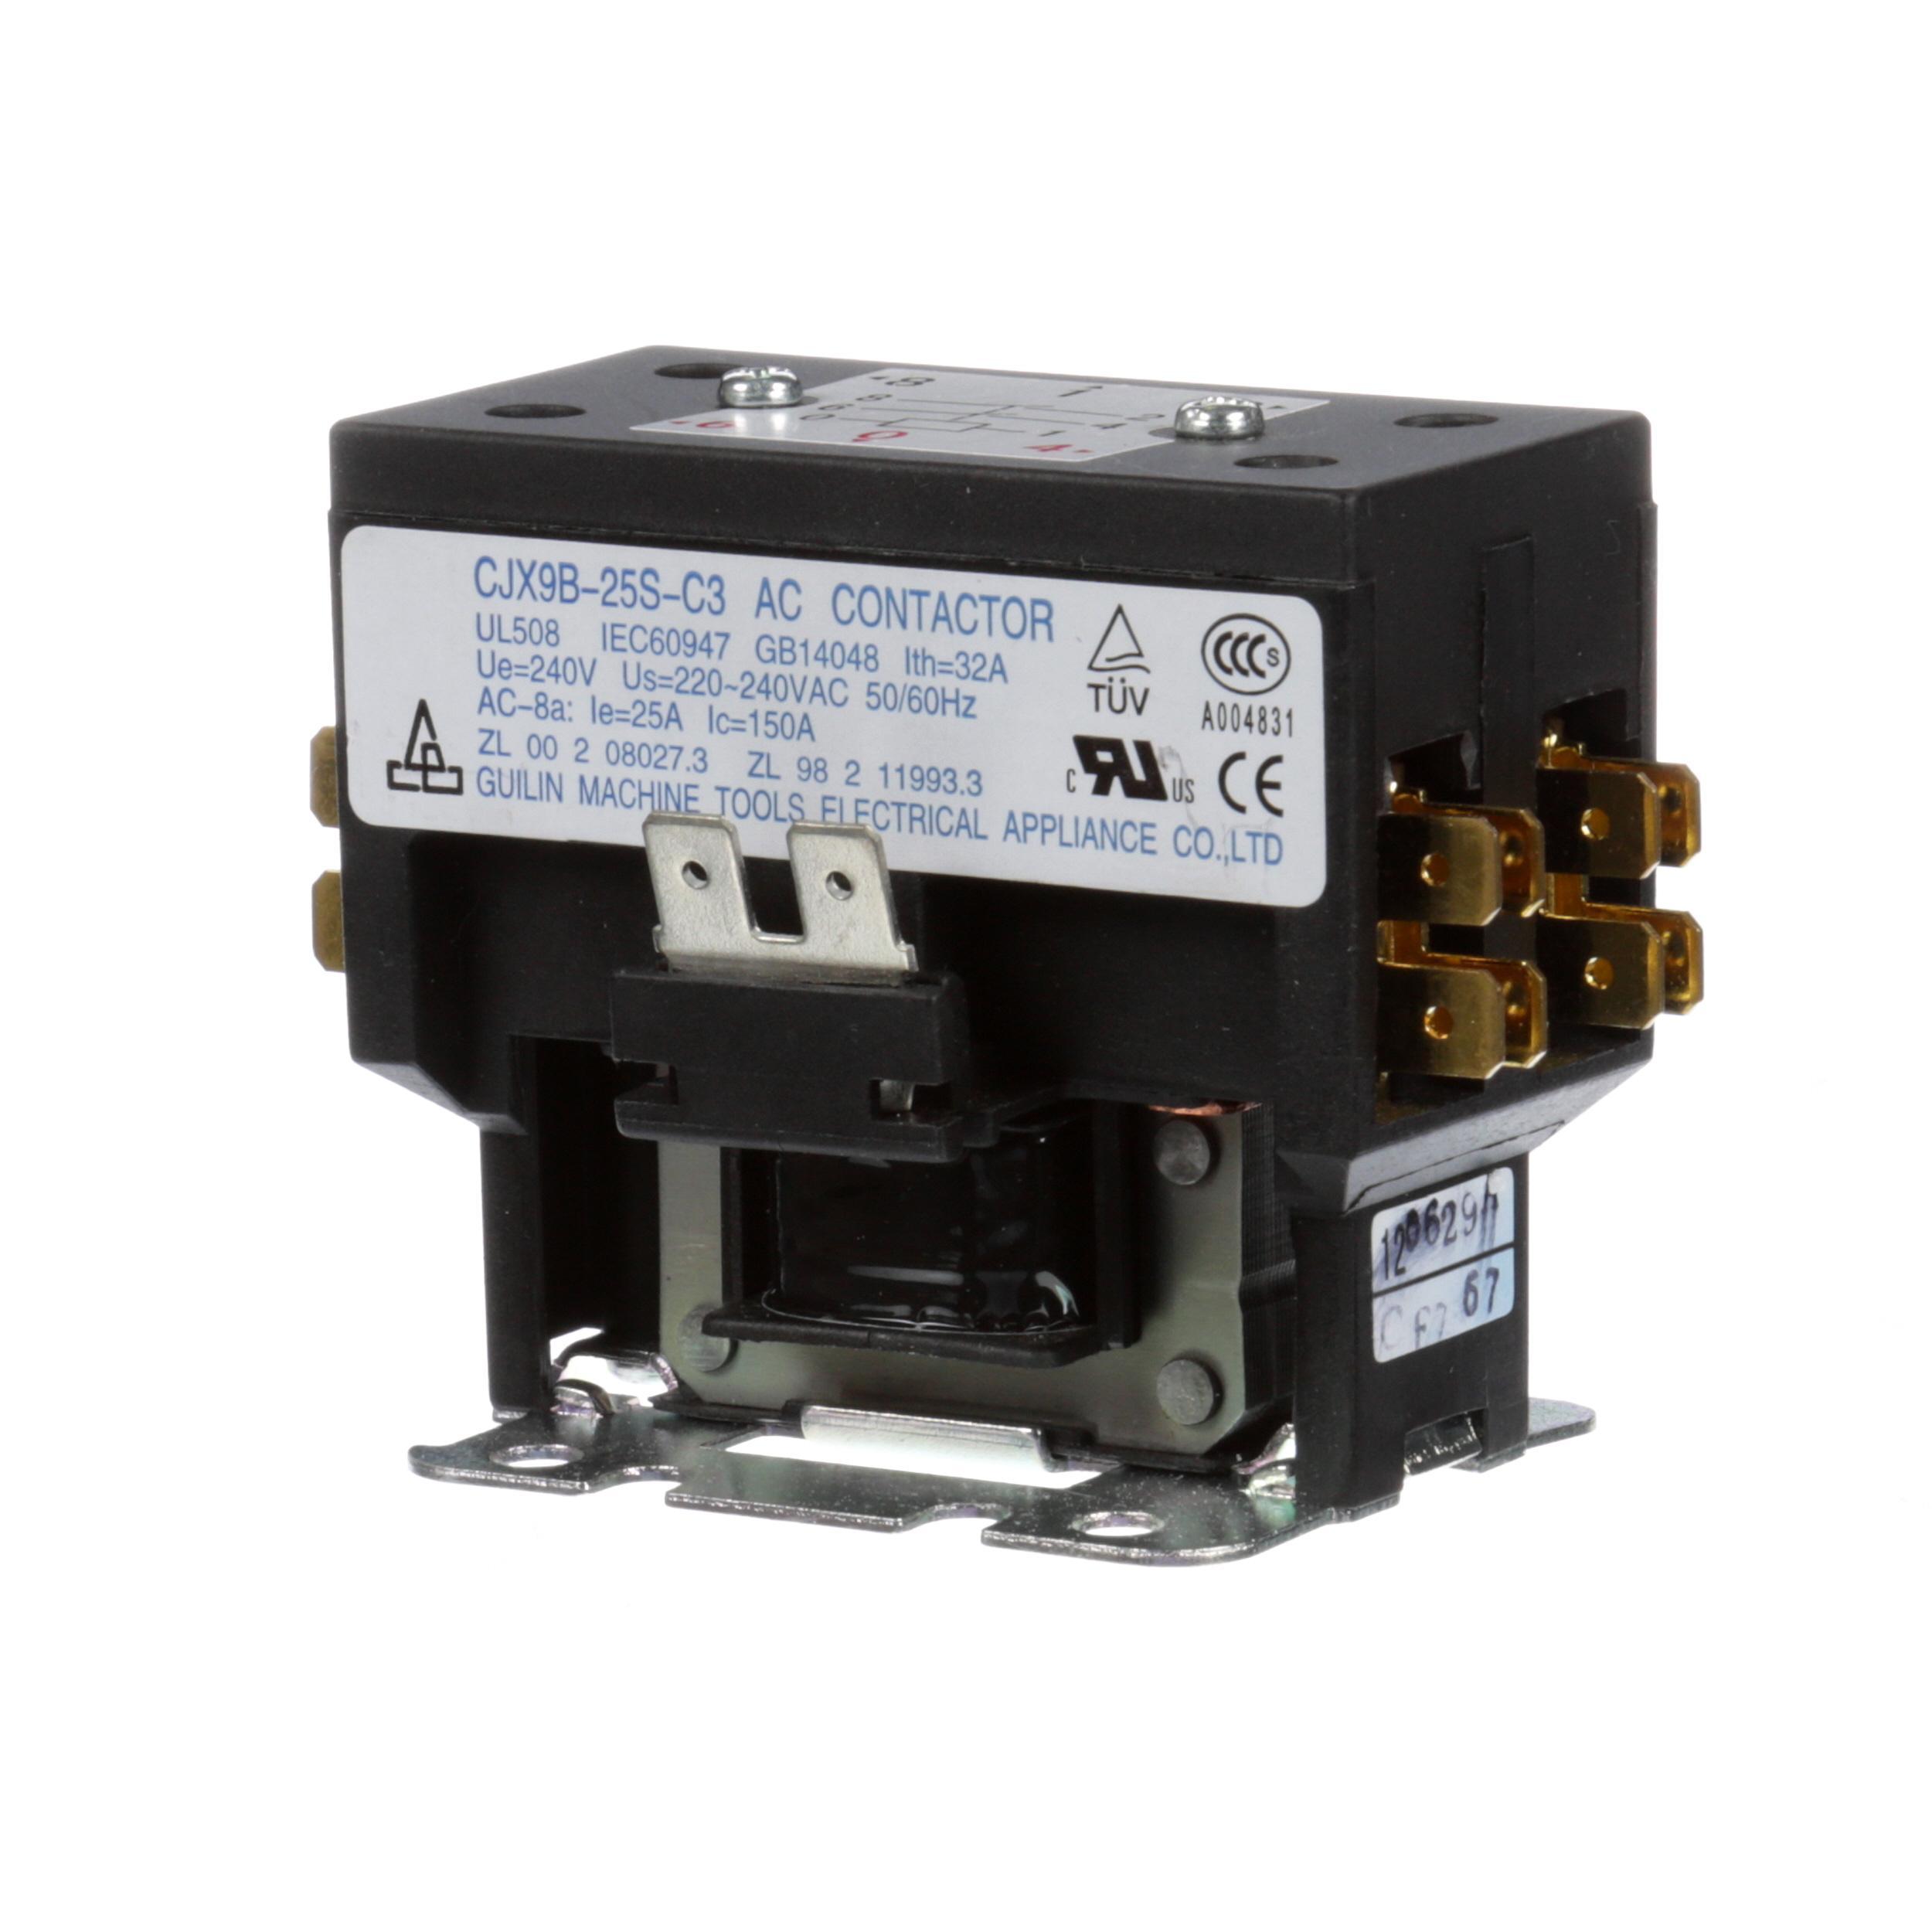 Donper usa main relay motor cmprsr part 130302040 for Motor manufacturers in usa